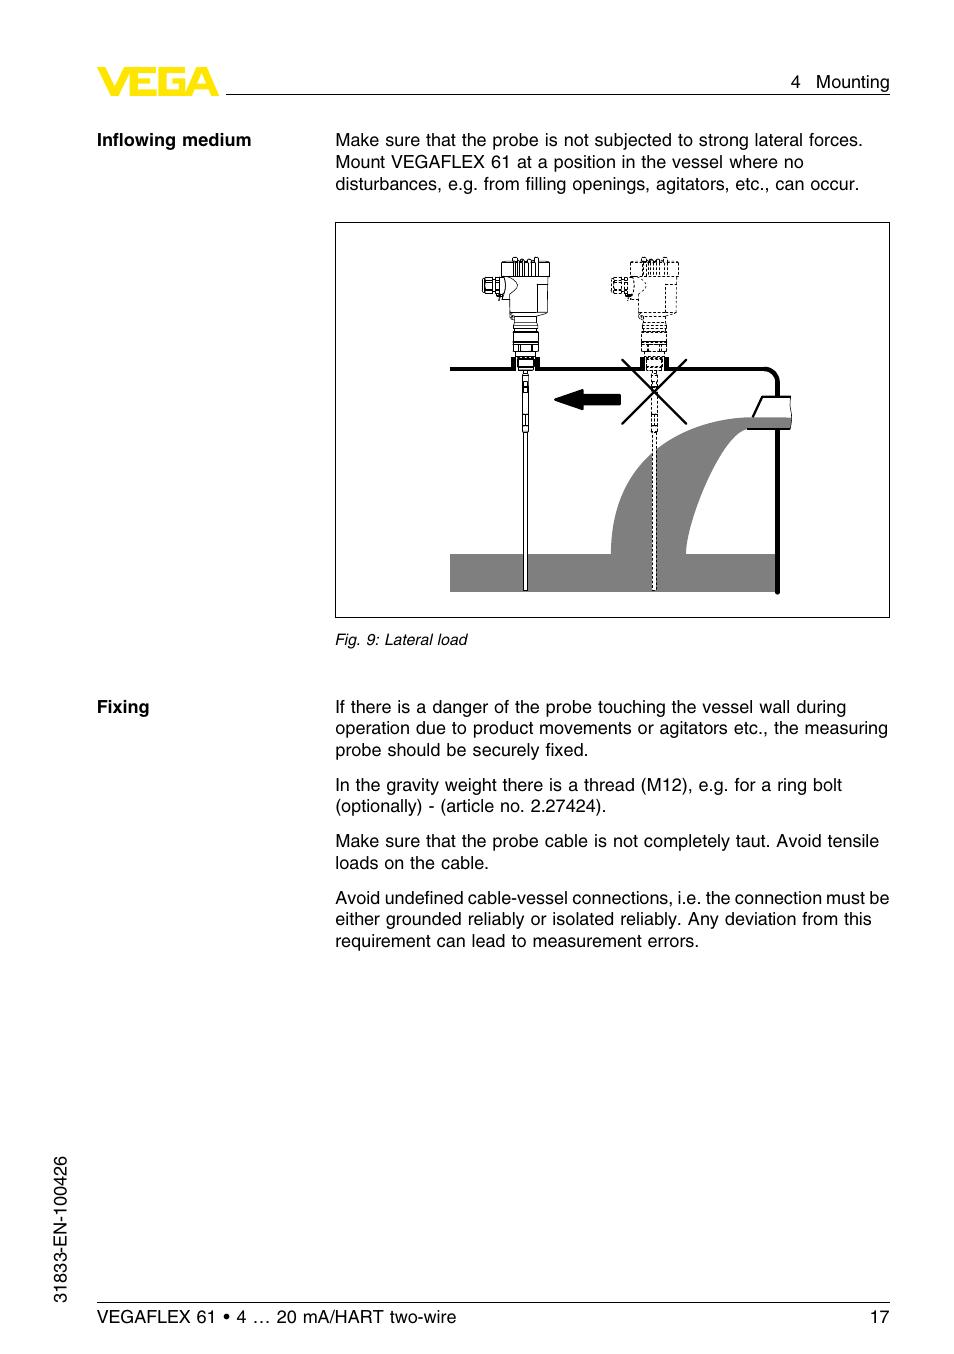 Vega vegaflex 61 foundation fieldbus user manual | page 54 / 64.